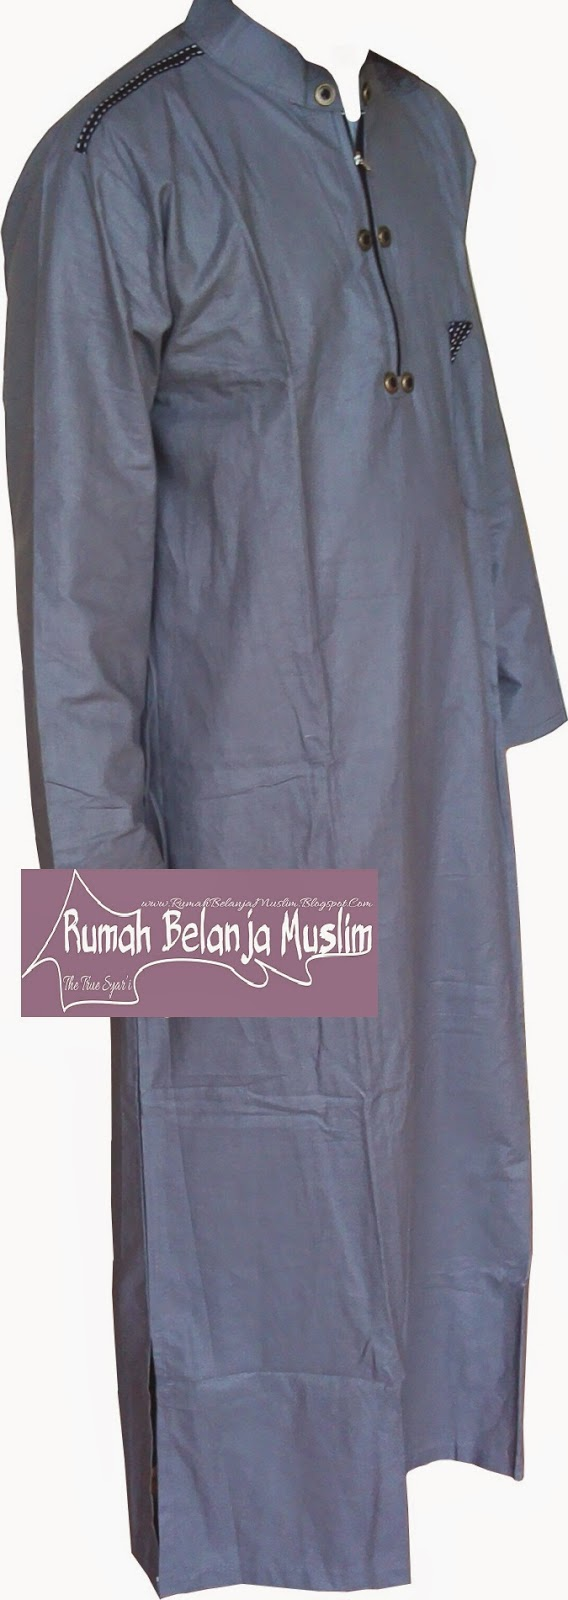 Jubah Ikhwan Abu